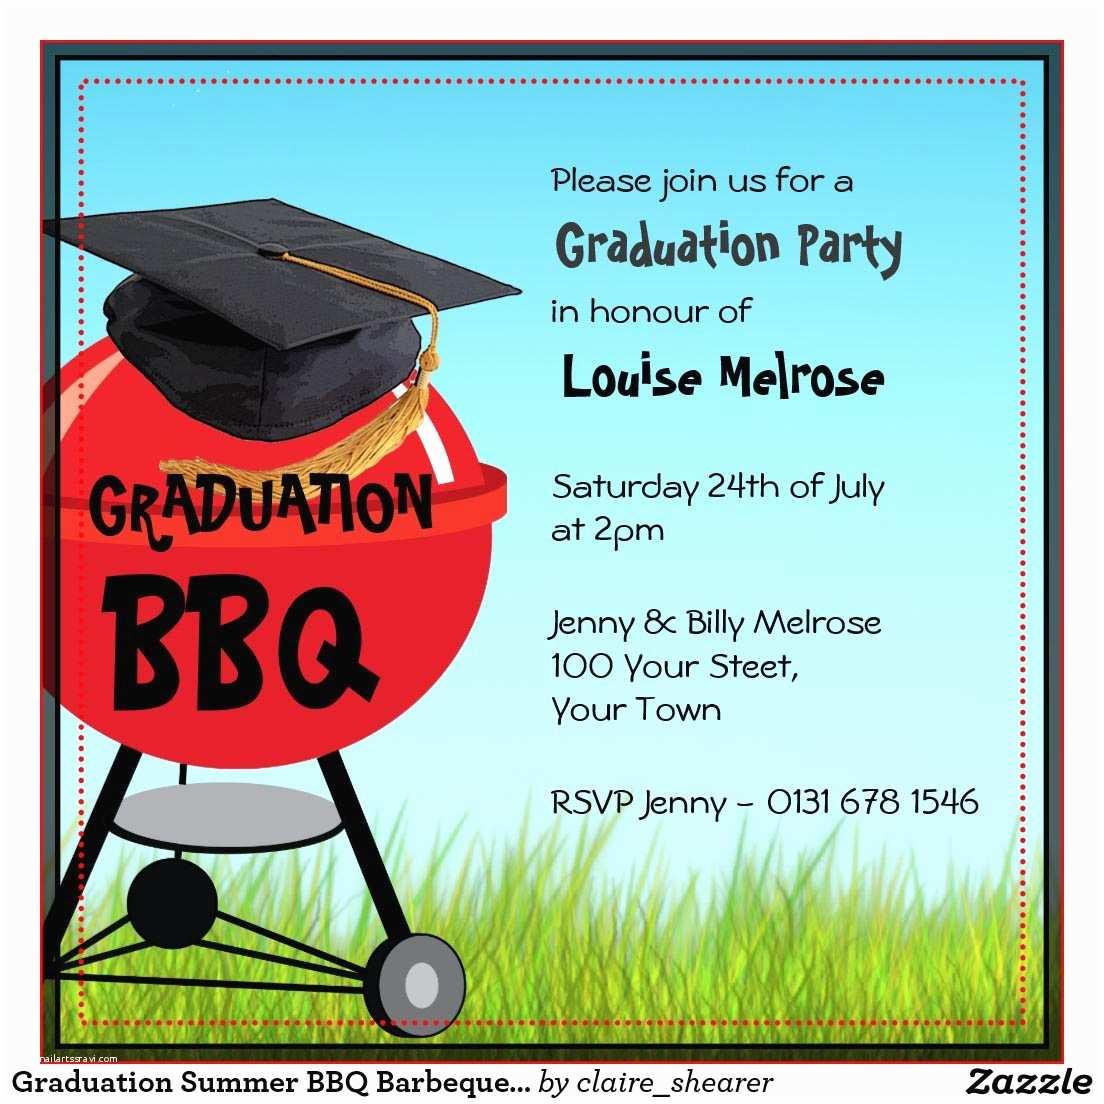 Graduation Reception Invitations Bbq Graduation Party Invitations